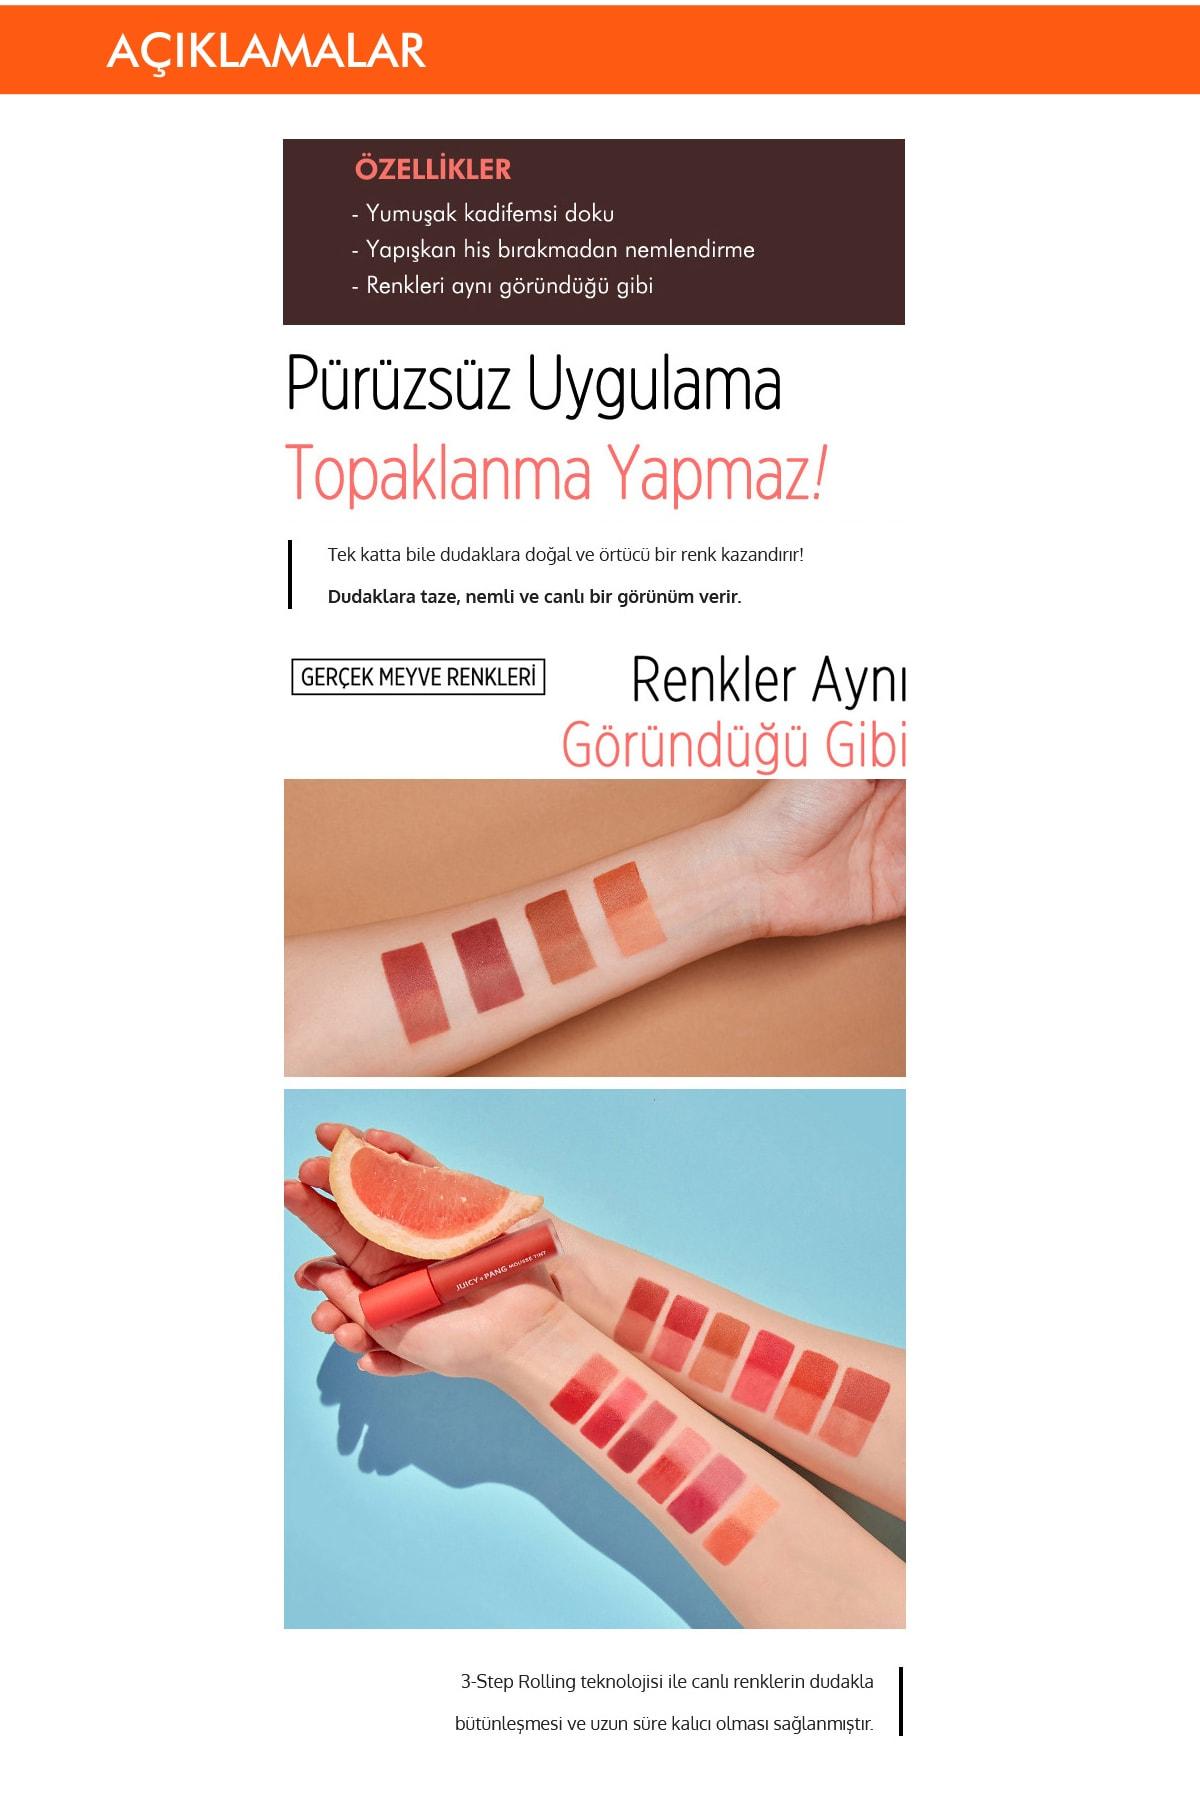 Missha Pürüzsüz Görünüm Sunan Kalıcı Köpük Tint  Ruj APIEU Juicy Pang Mousse Tint (PK01) 3